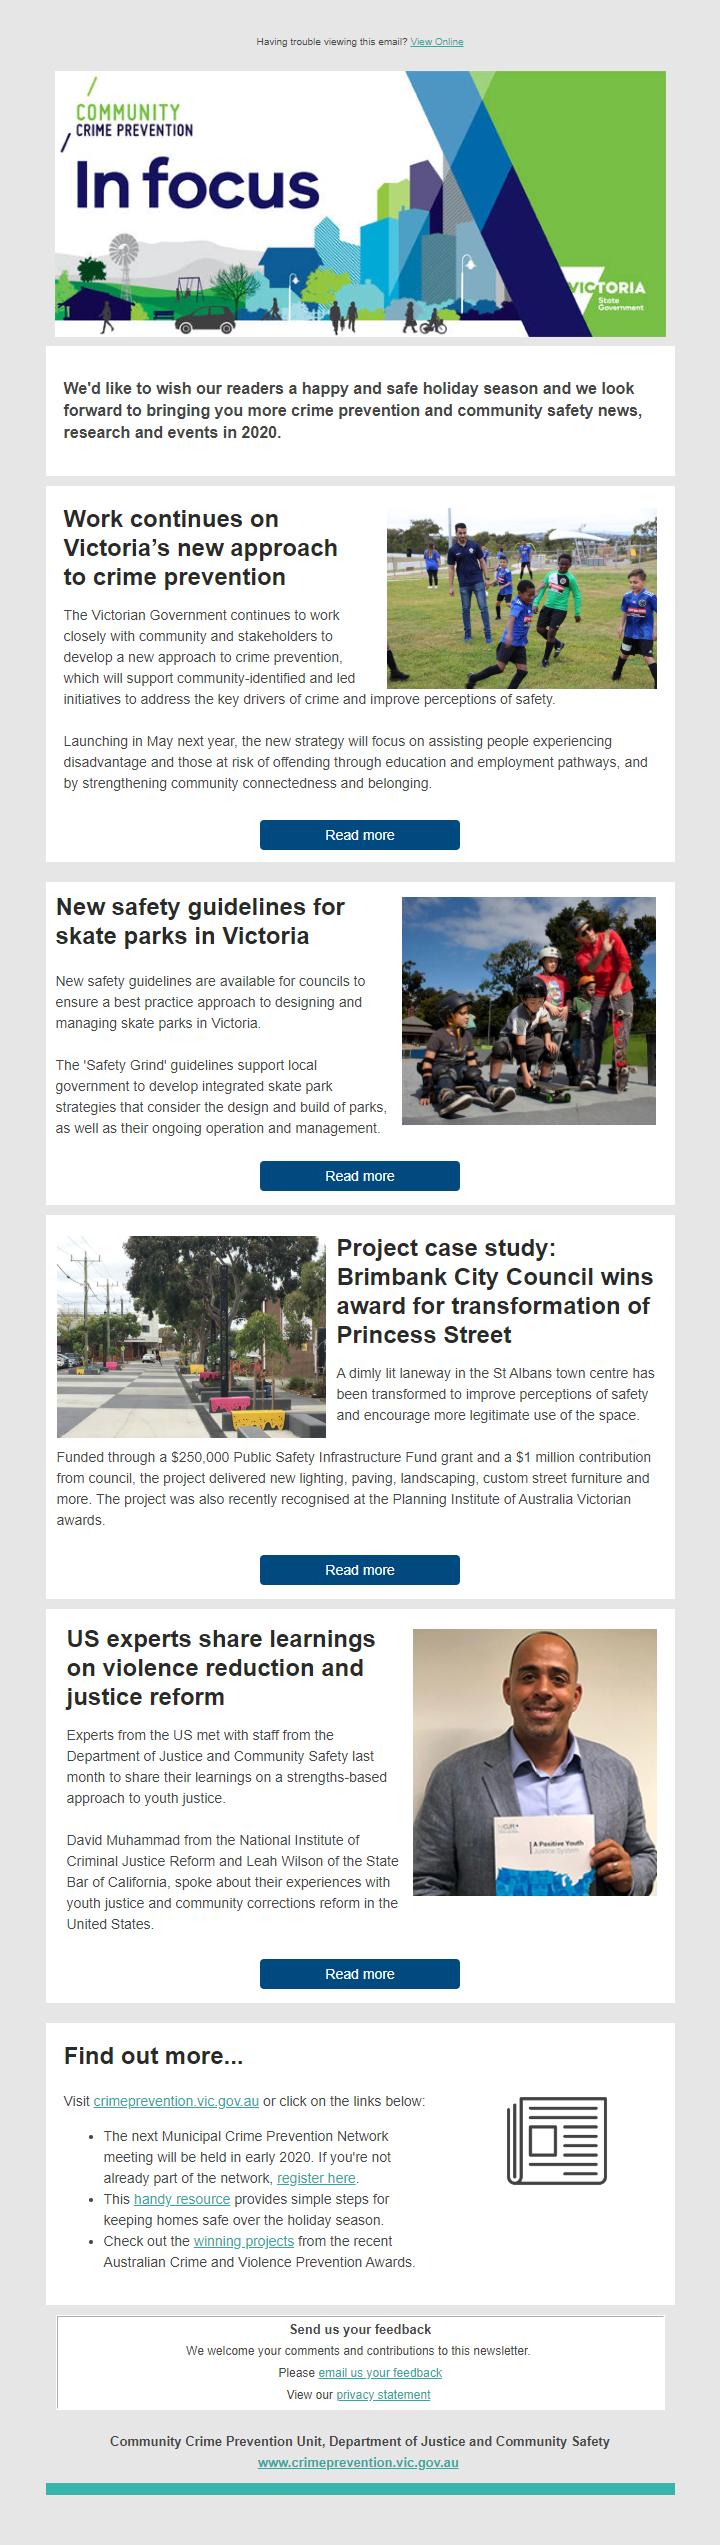 Community Crime Prevention